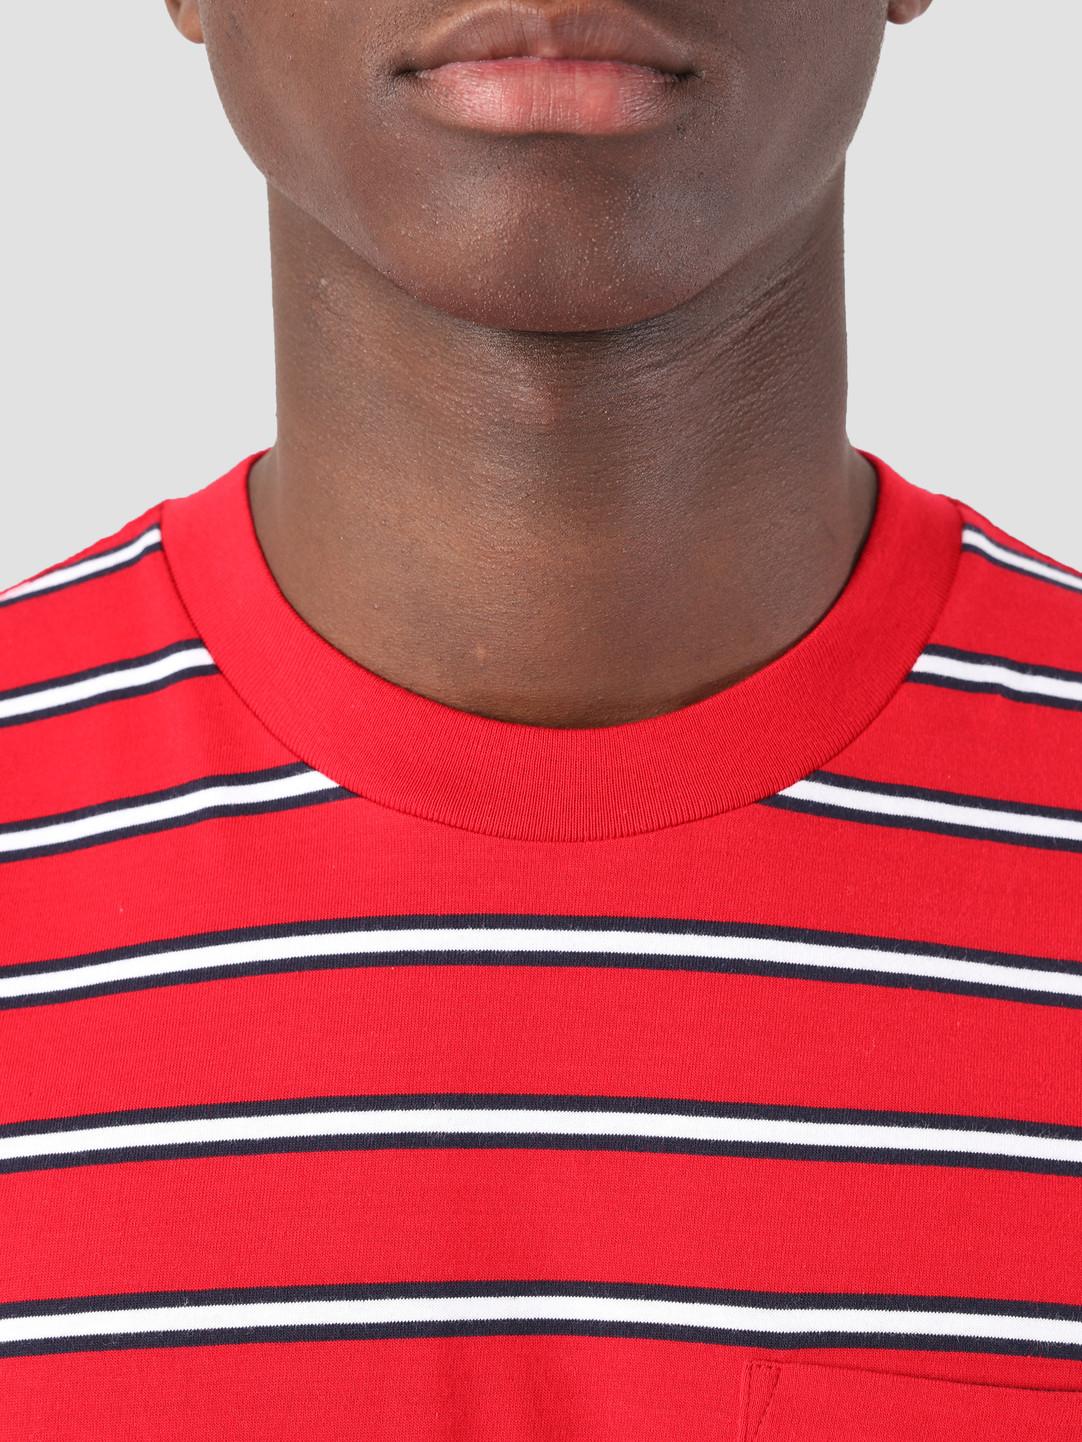 Carhartt WIP Carhartt WIP Houston Pocket T-Shirt Stripe Houston Stripe, Cardinal I026370